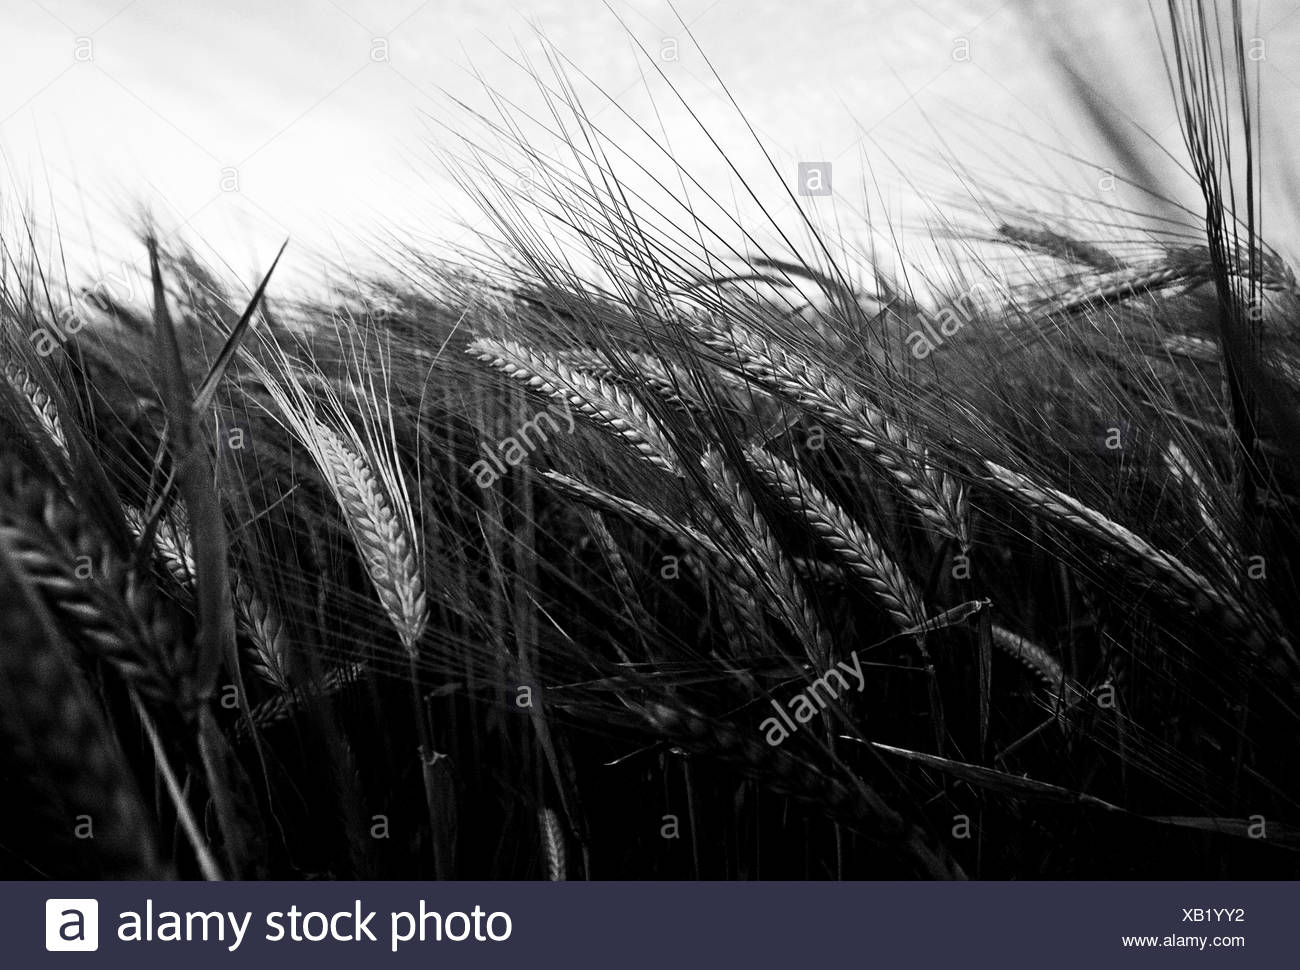 Close up of barley field Photo Stock